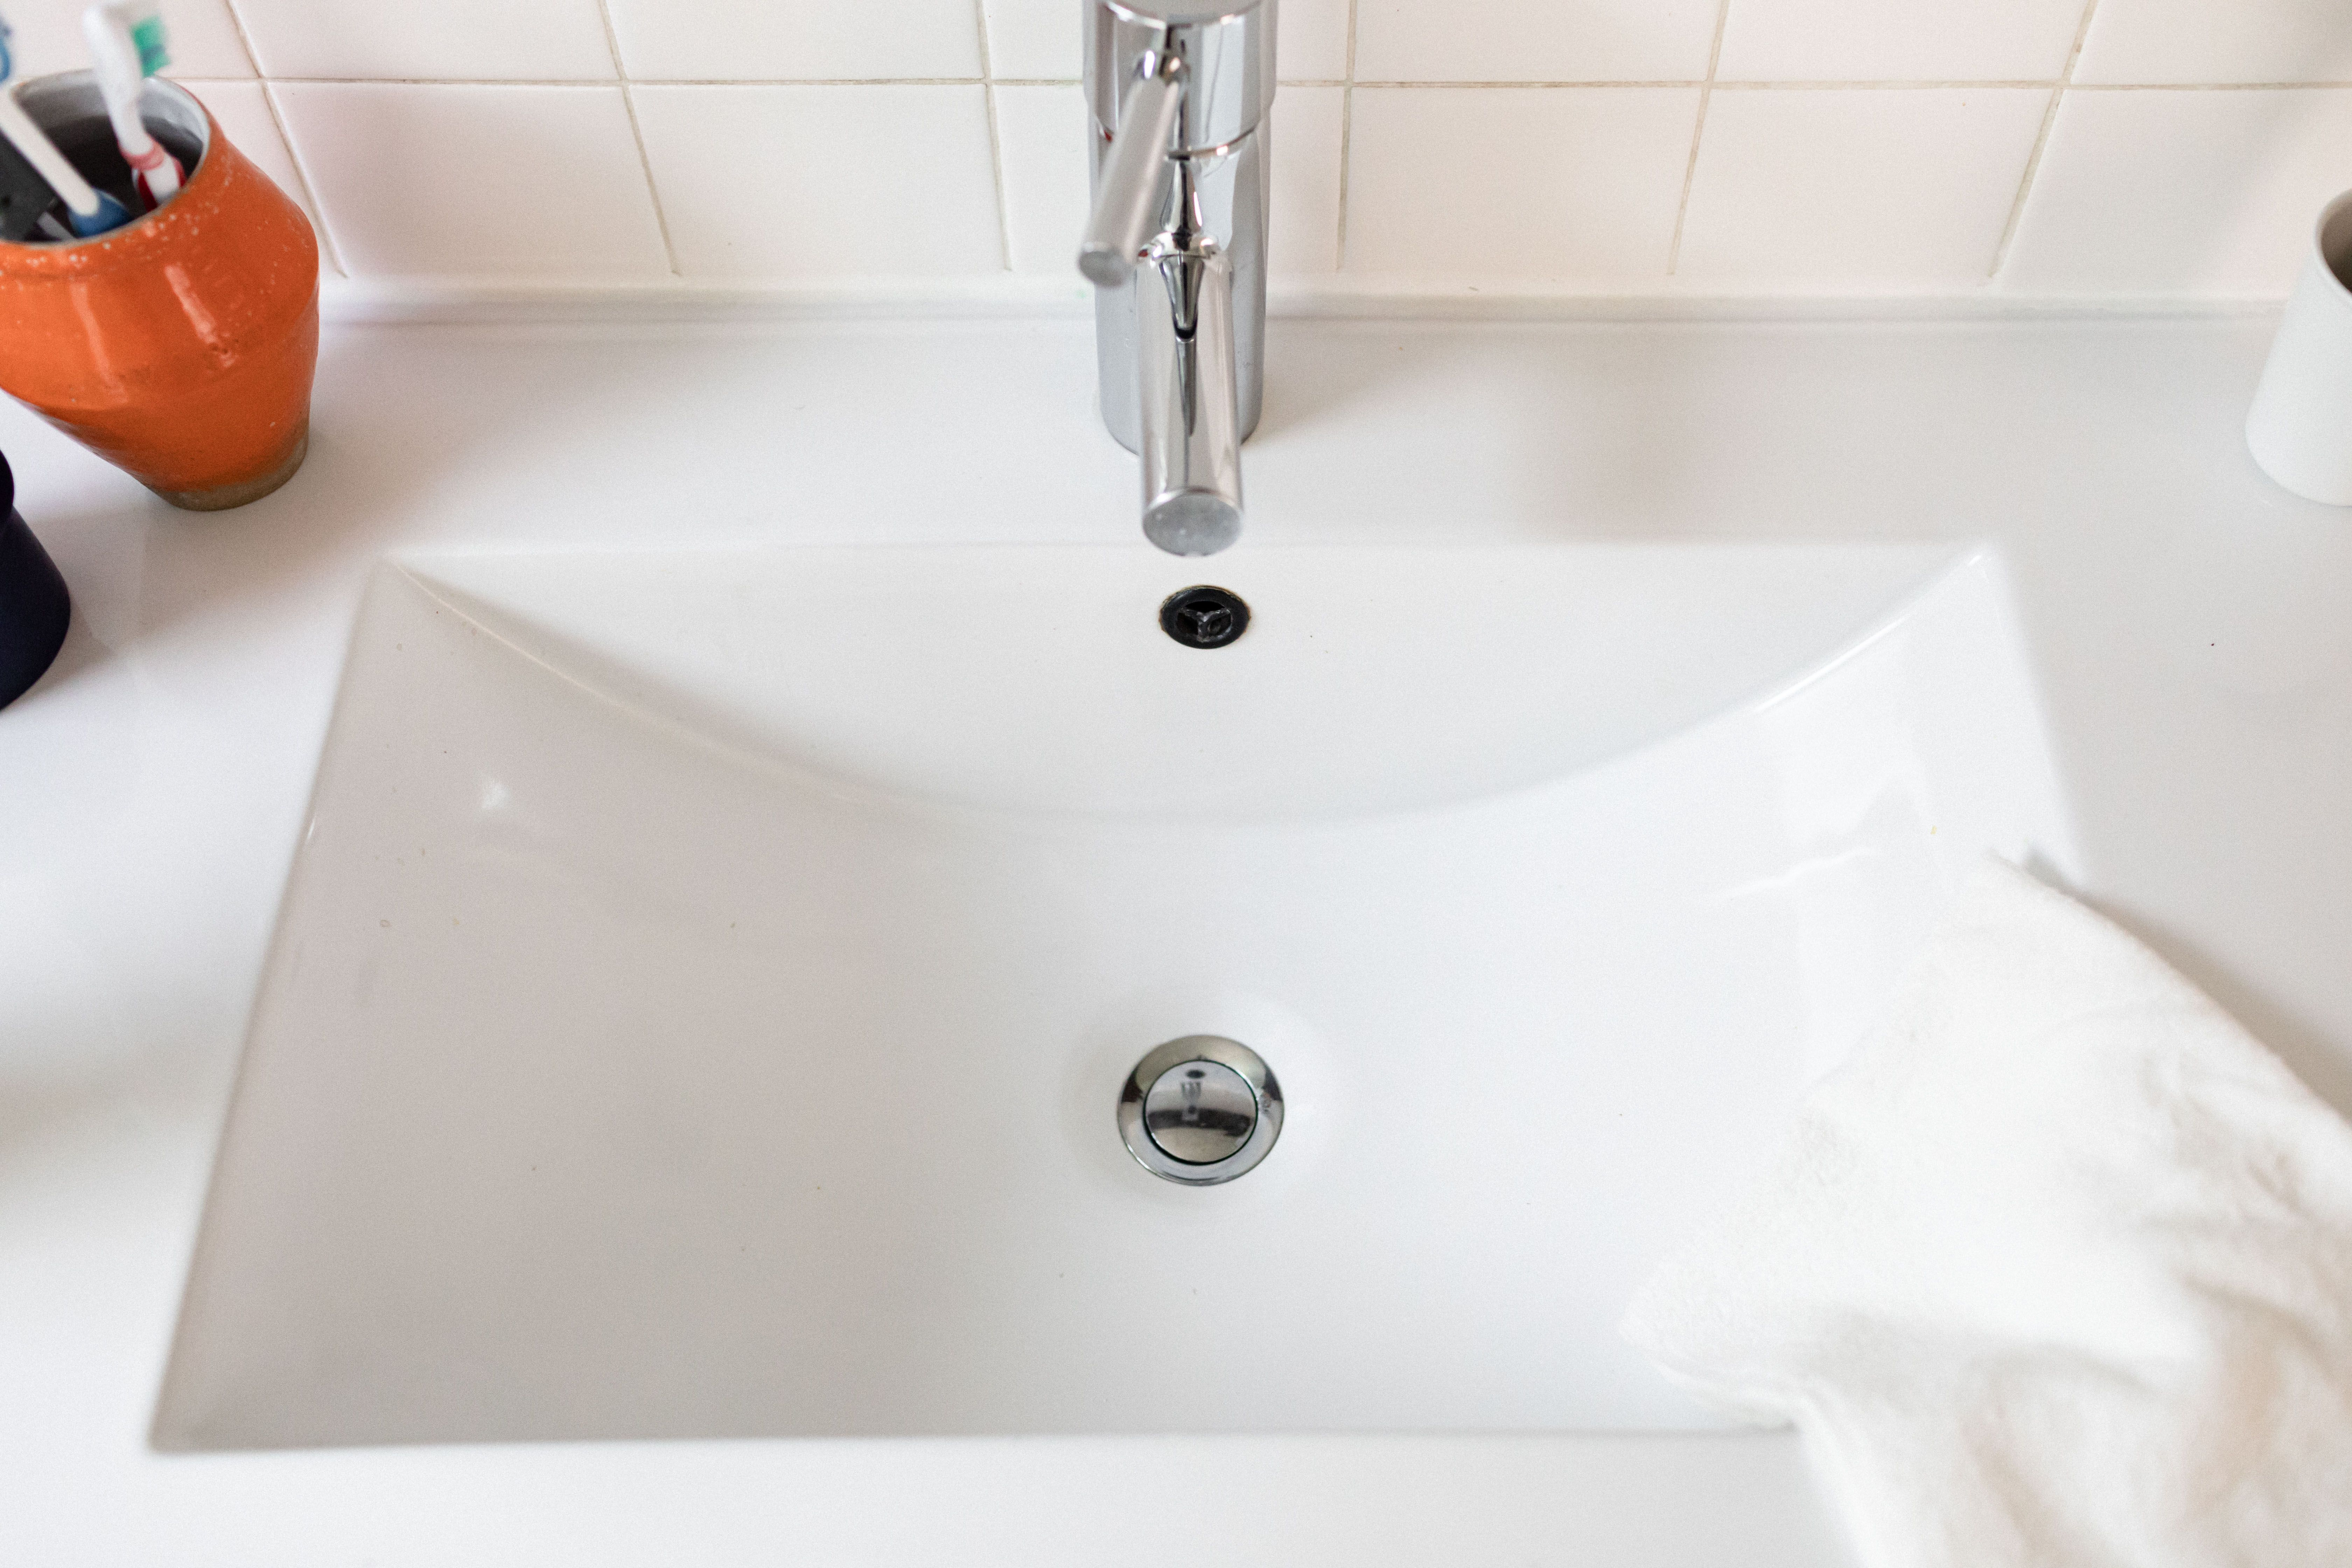 Got A Bathroom Sink Drain That Smells Here S How To Clean Sink Drain Bathroom Sink Drain Bathroom Sink